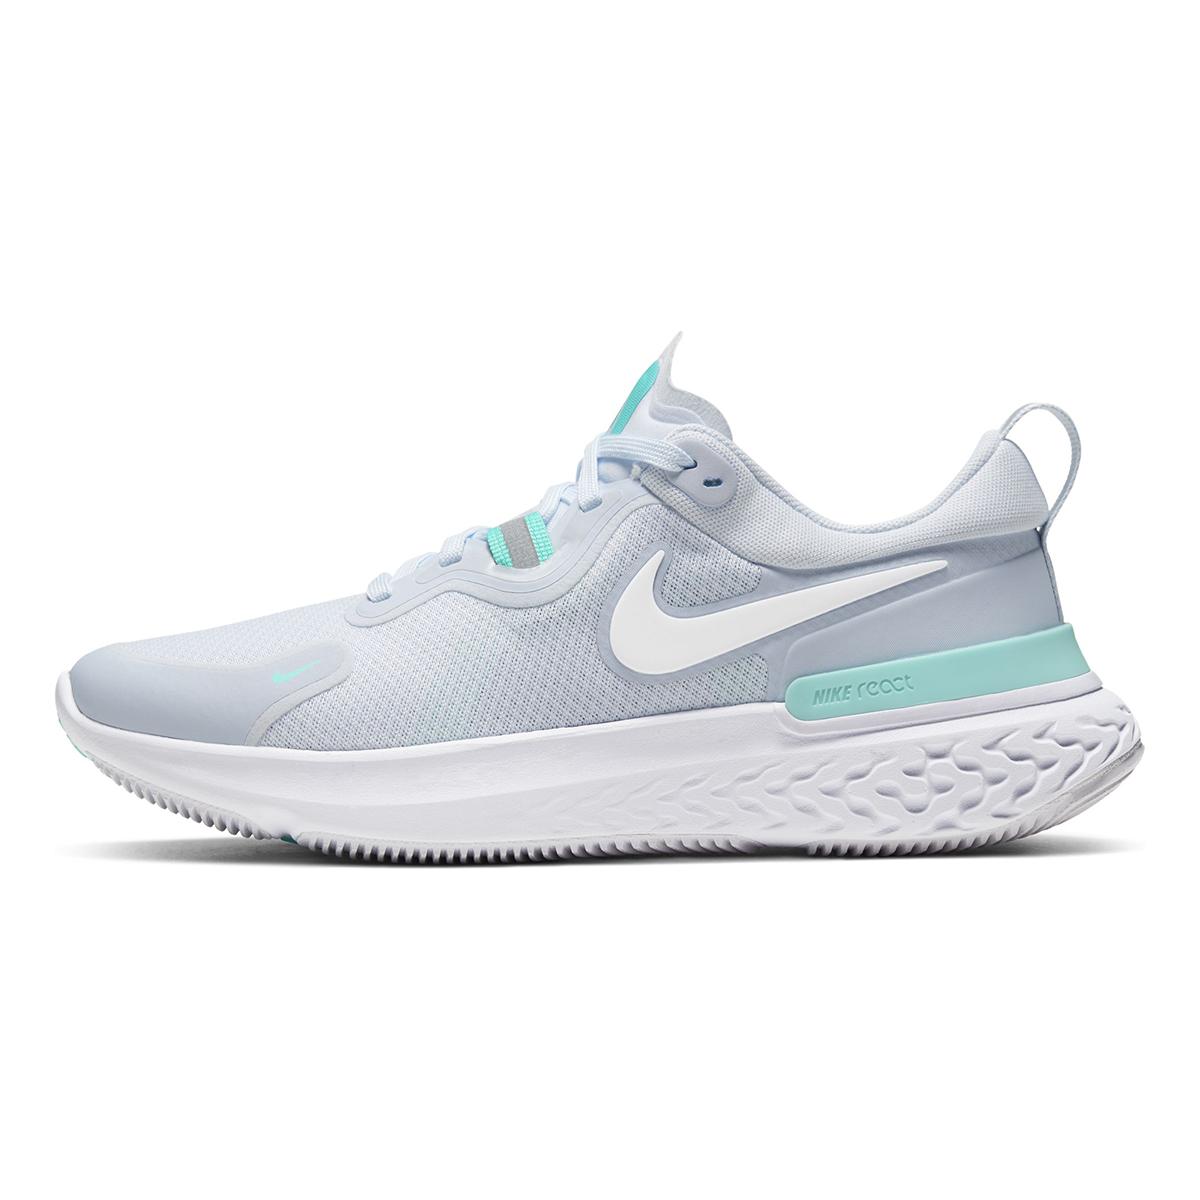 Women's Nike React Miler Running Shoe - Color: Football Grey/Aurora Green/White (Regular Width) - Size: 5.5, Football Grey/Aurora Green/White, large, image 2